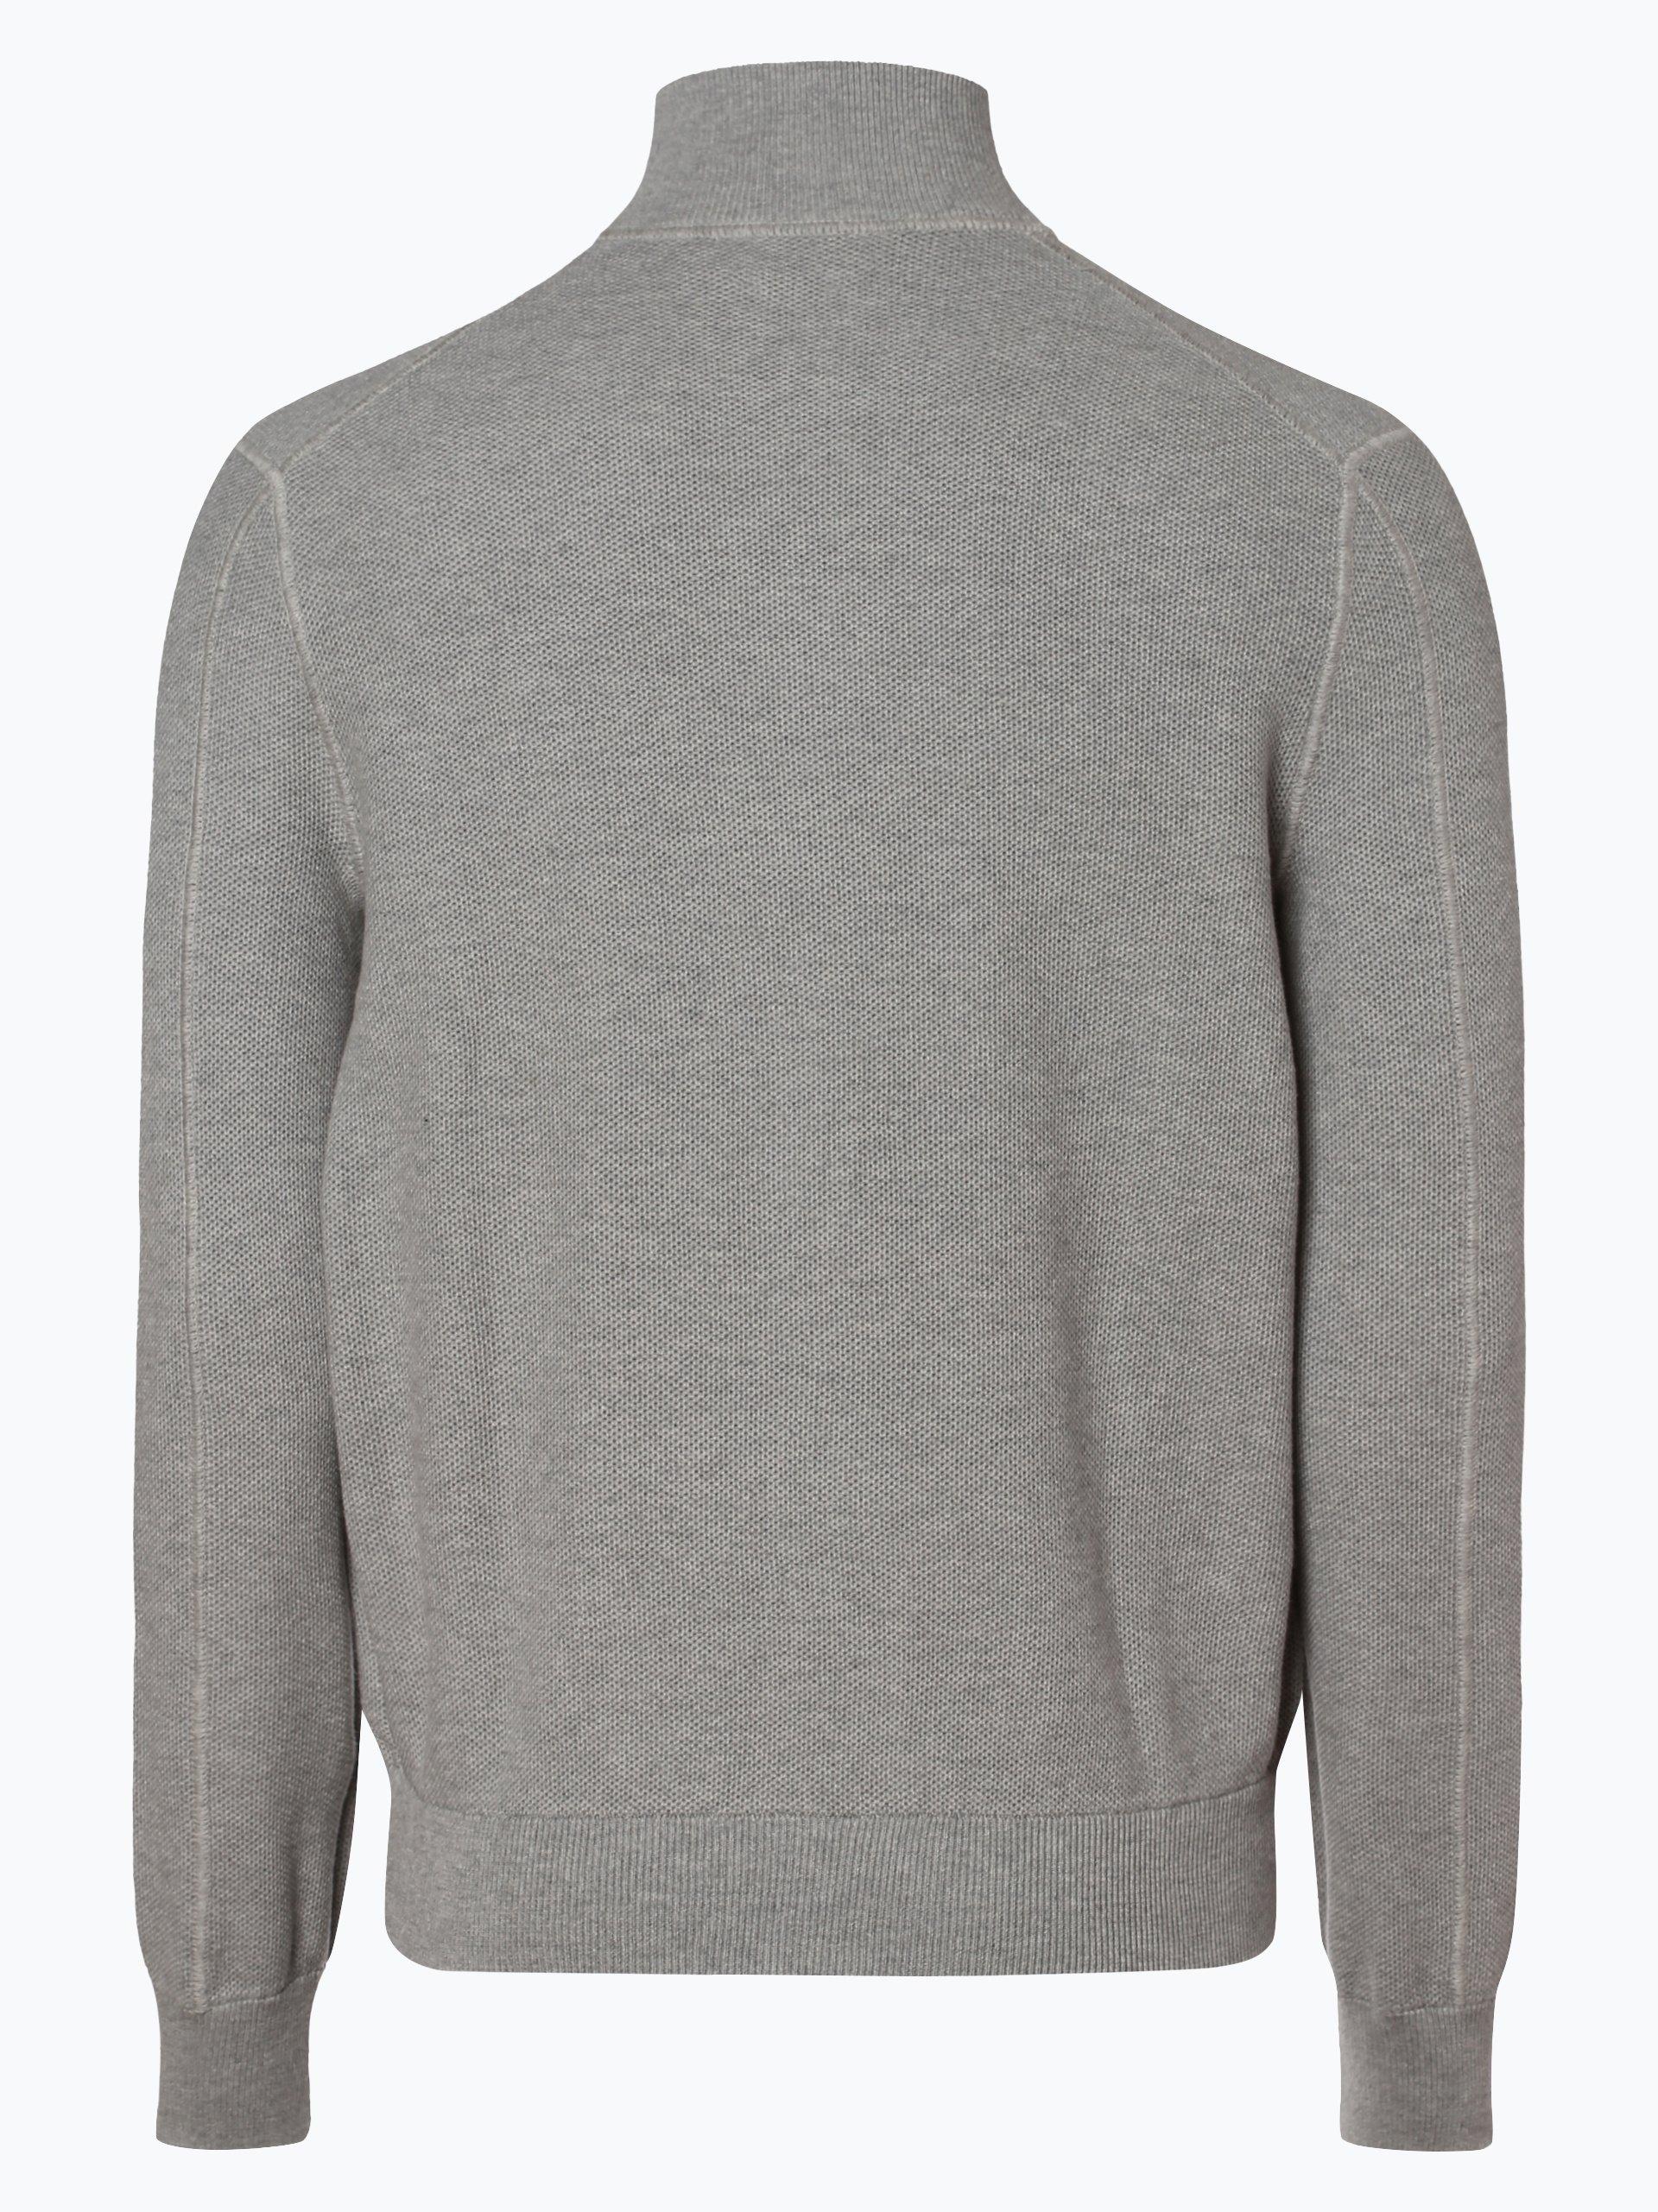 603e39c4c9043b Polo Ralph Lauren Herren Strickjacke online kaufen